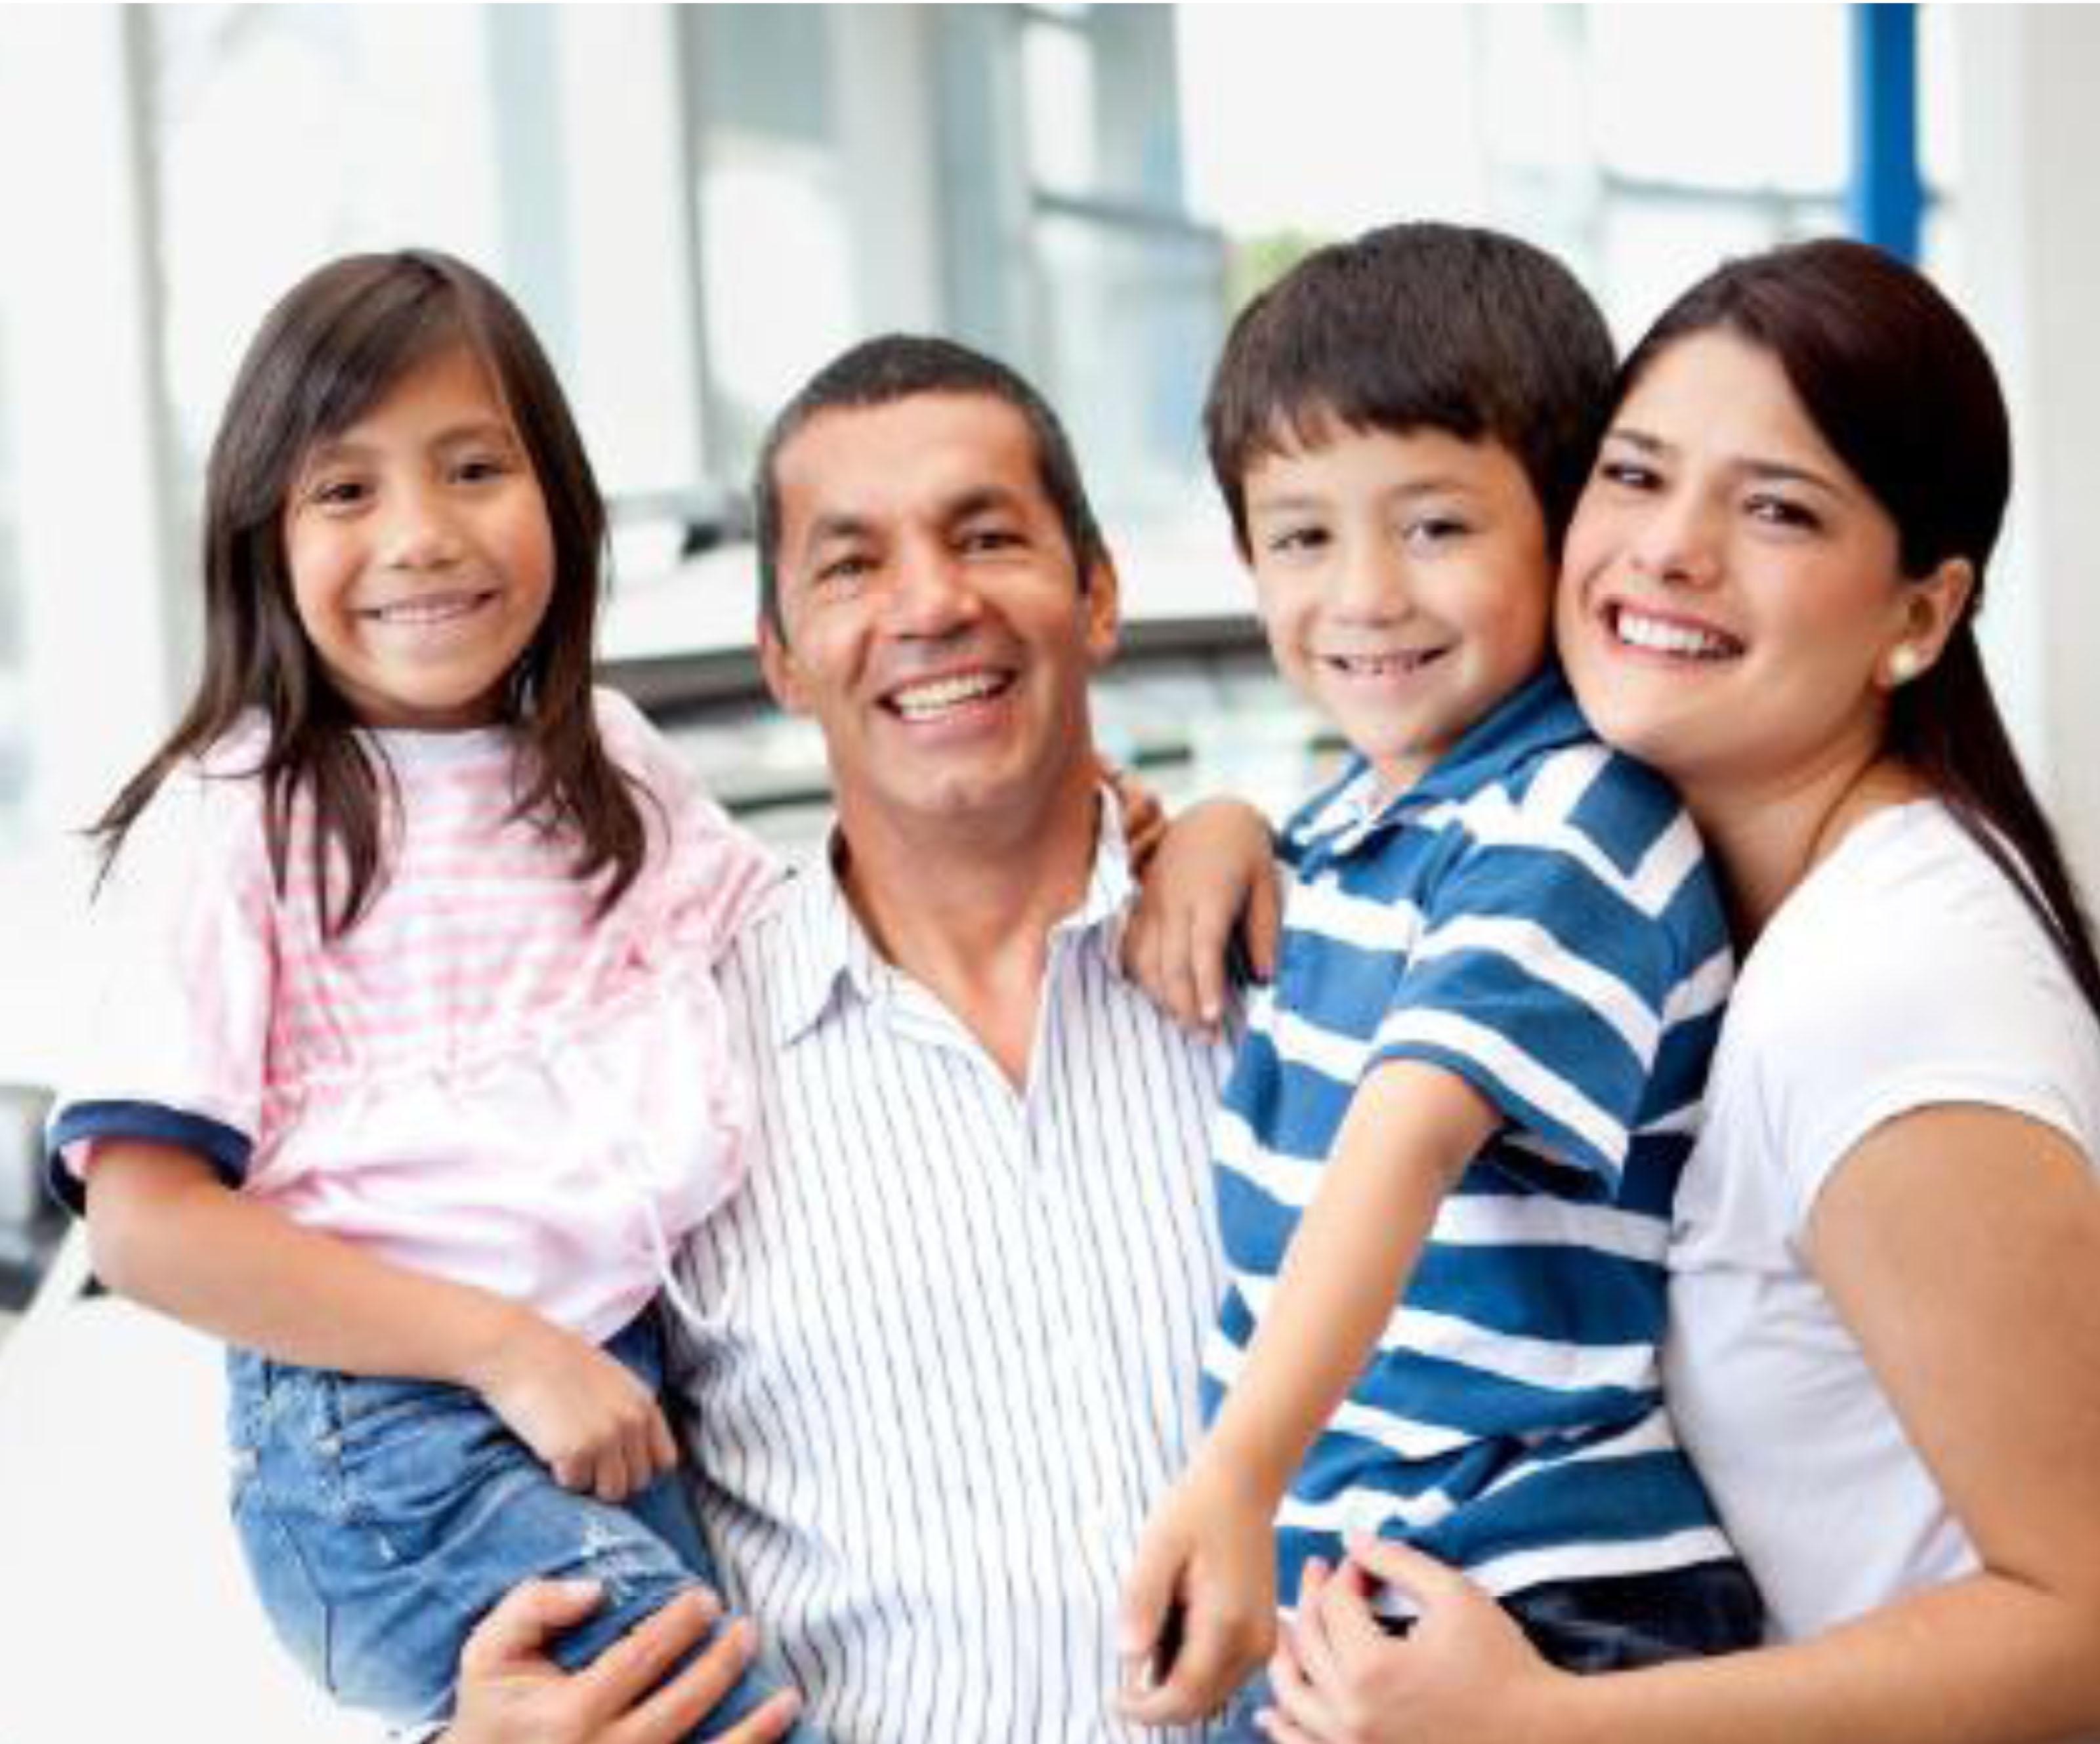 life insurance hispanic research